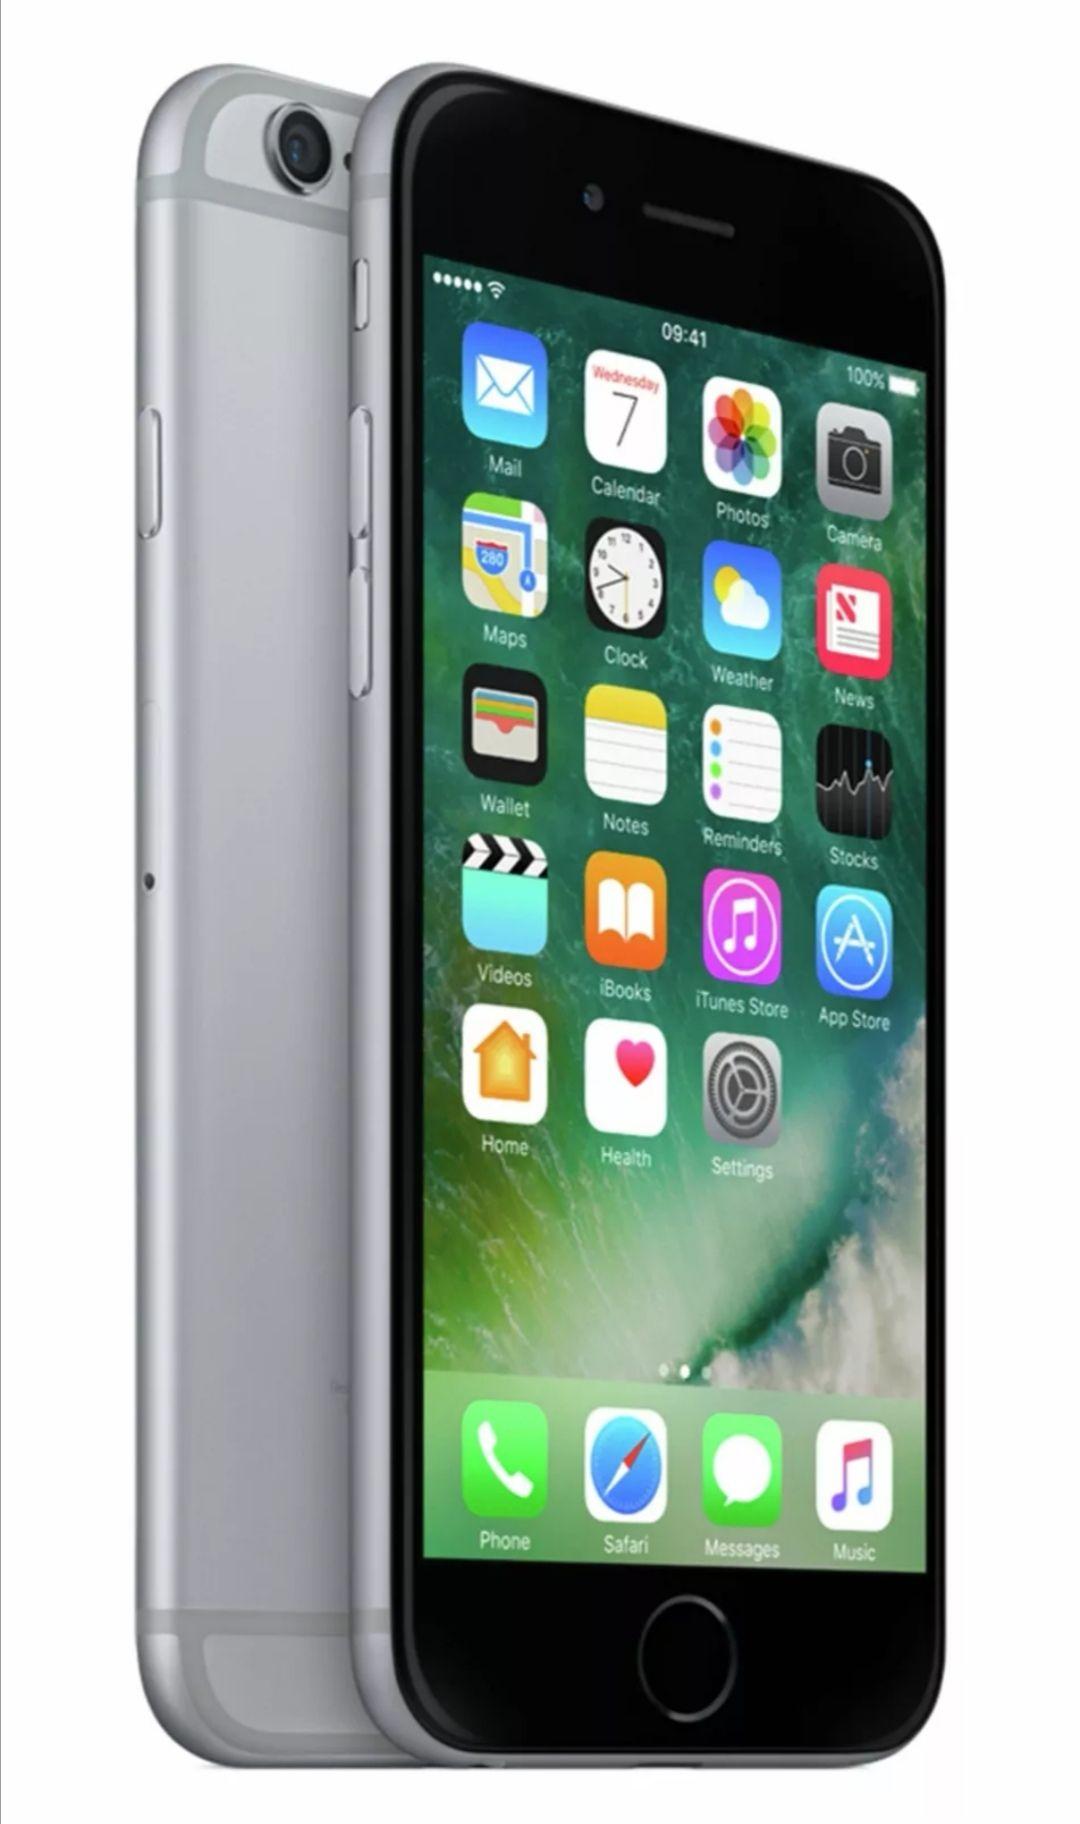 Brand New SIM Free Apple iPhone 6 4.7 Inch 32GB 8MP 4G iOS Mobile Phone - Space Grey £159.99 @ Argos Ebay